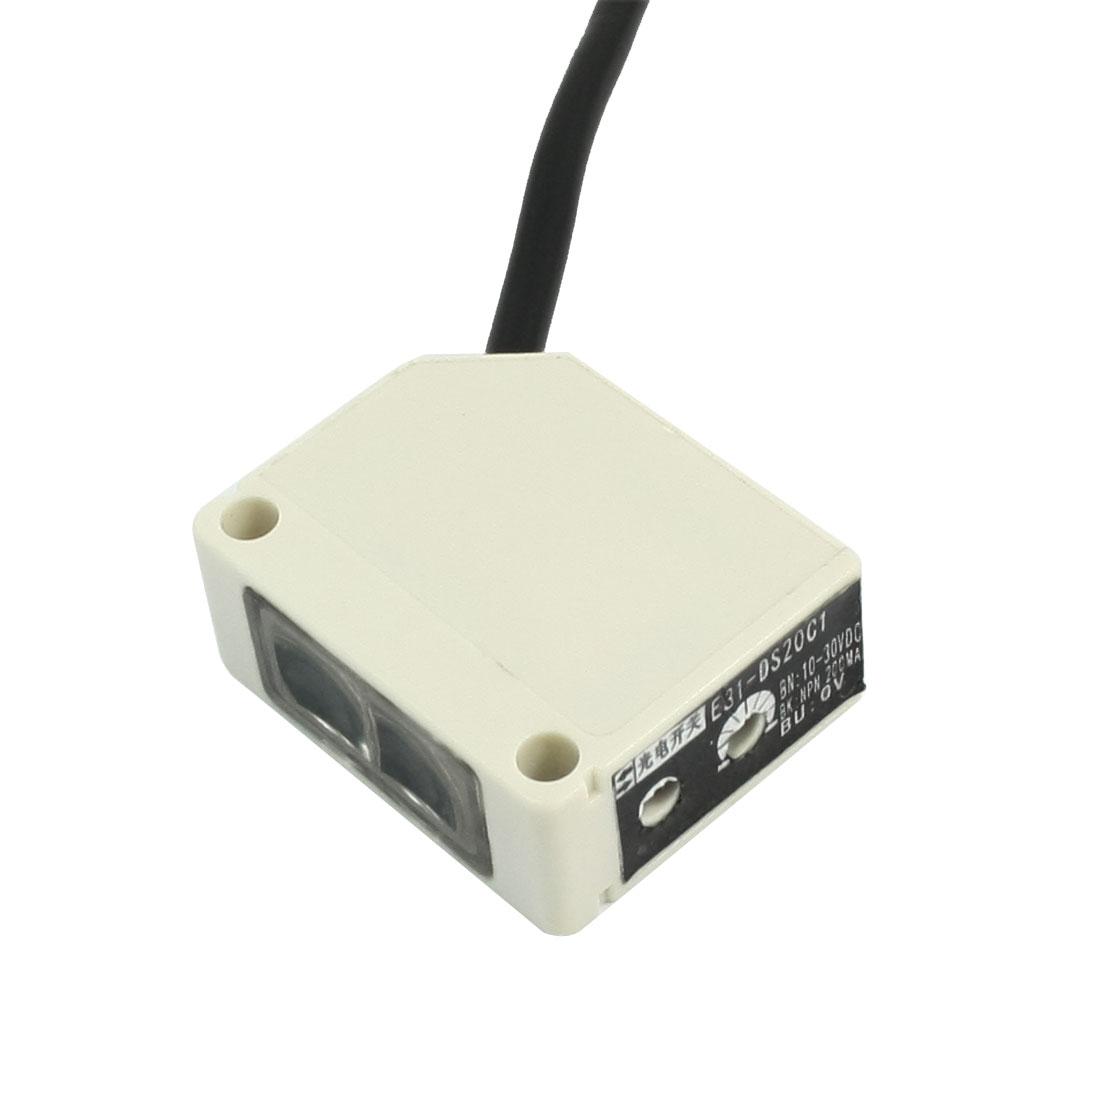 NPN 20cm Diffusion Proximity Photoelectric Sensor Photoswitch E31-DS20C1